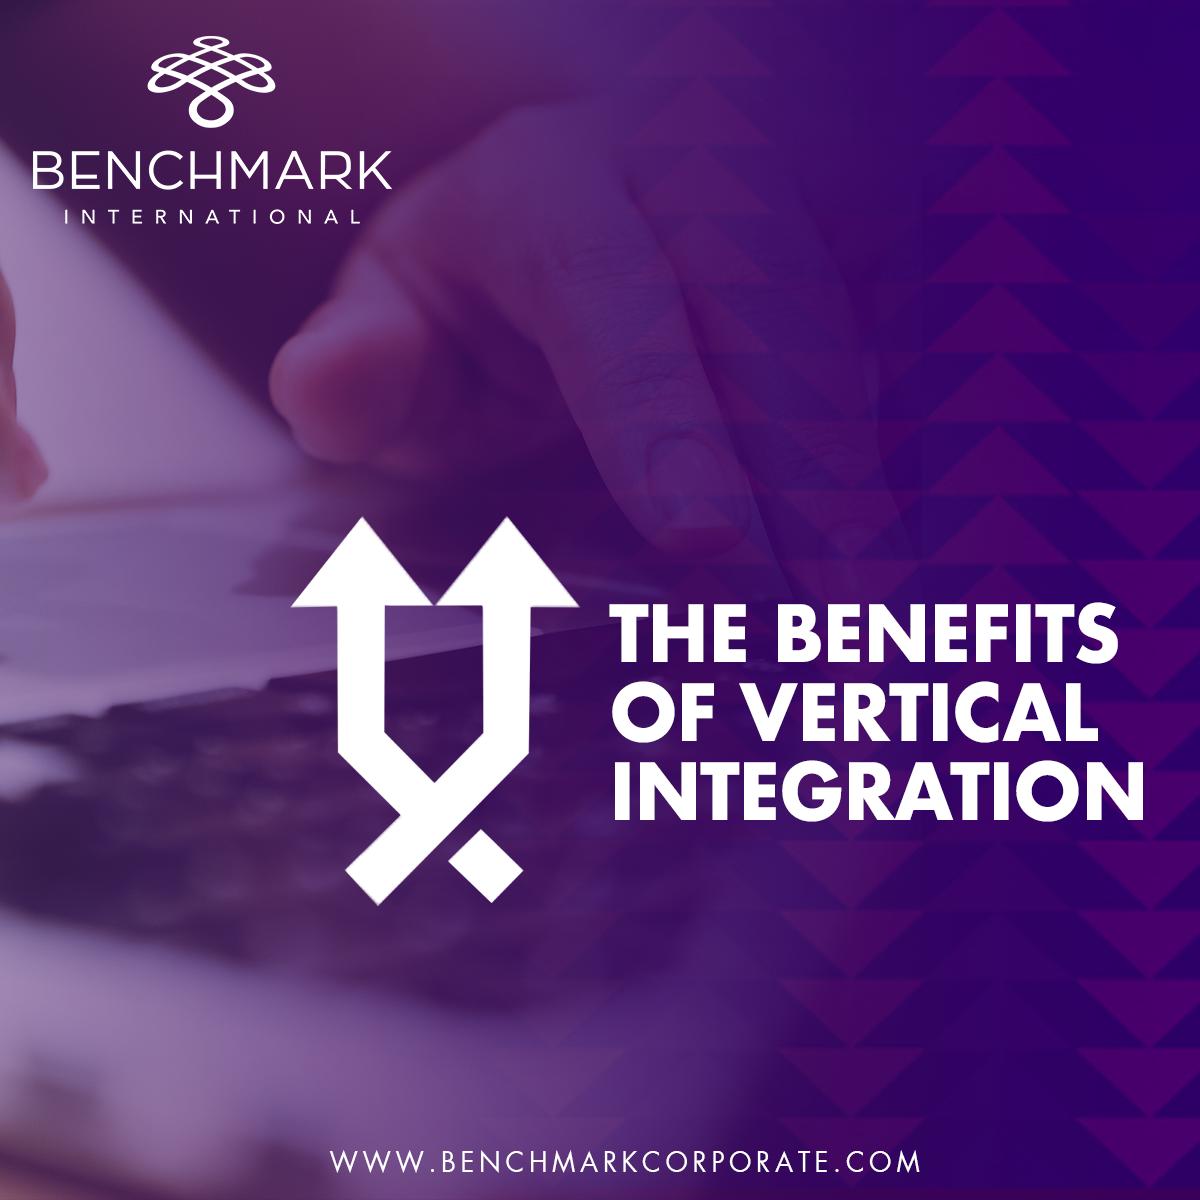 Benefits of Vertical Integration